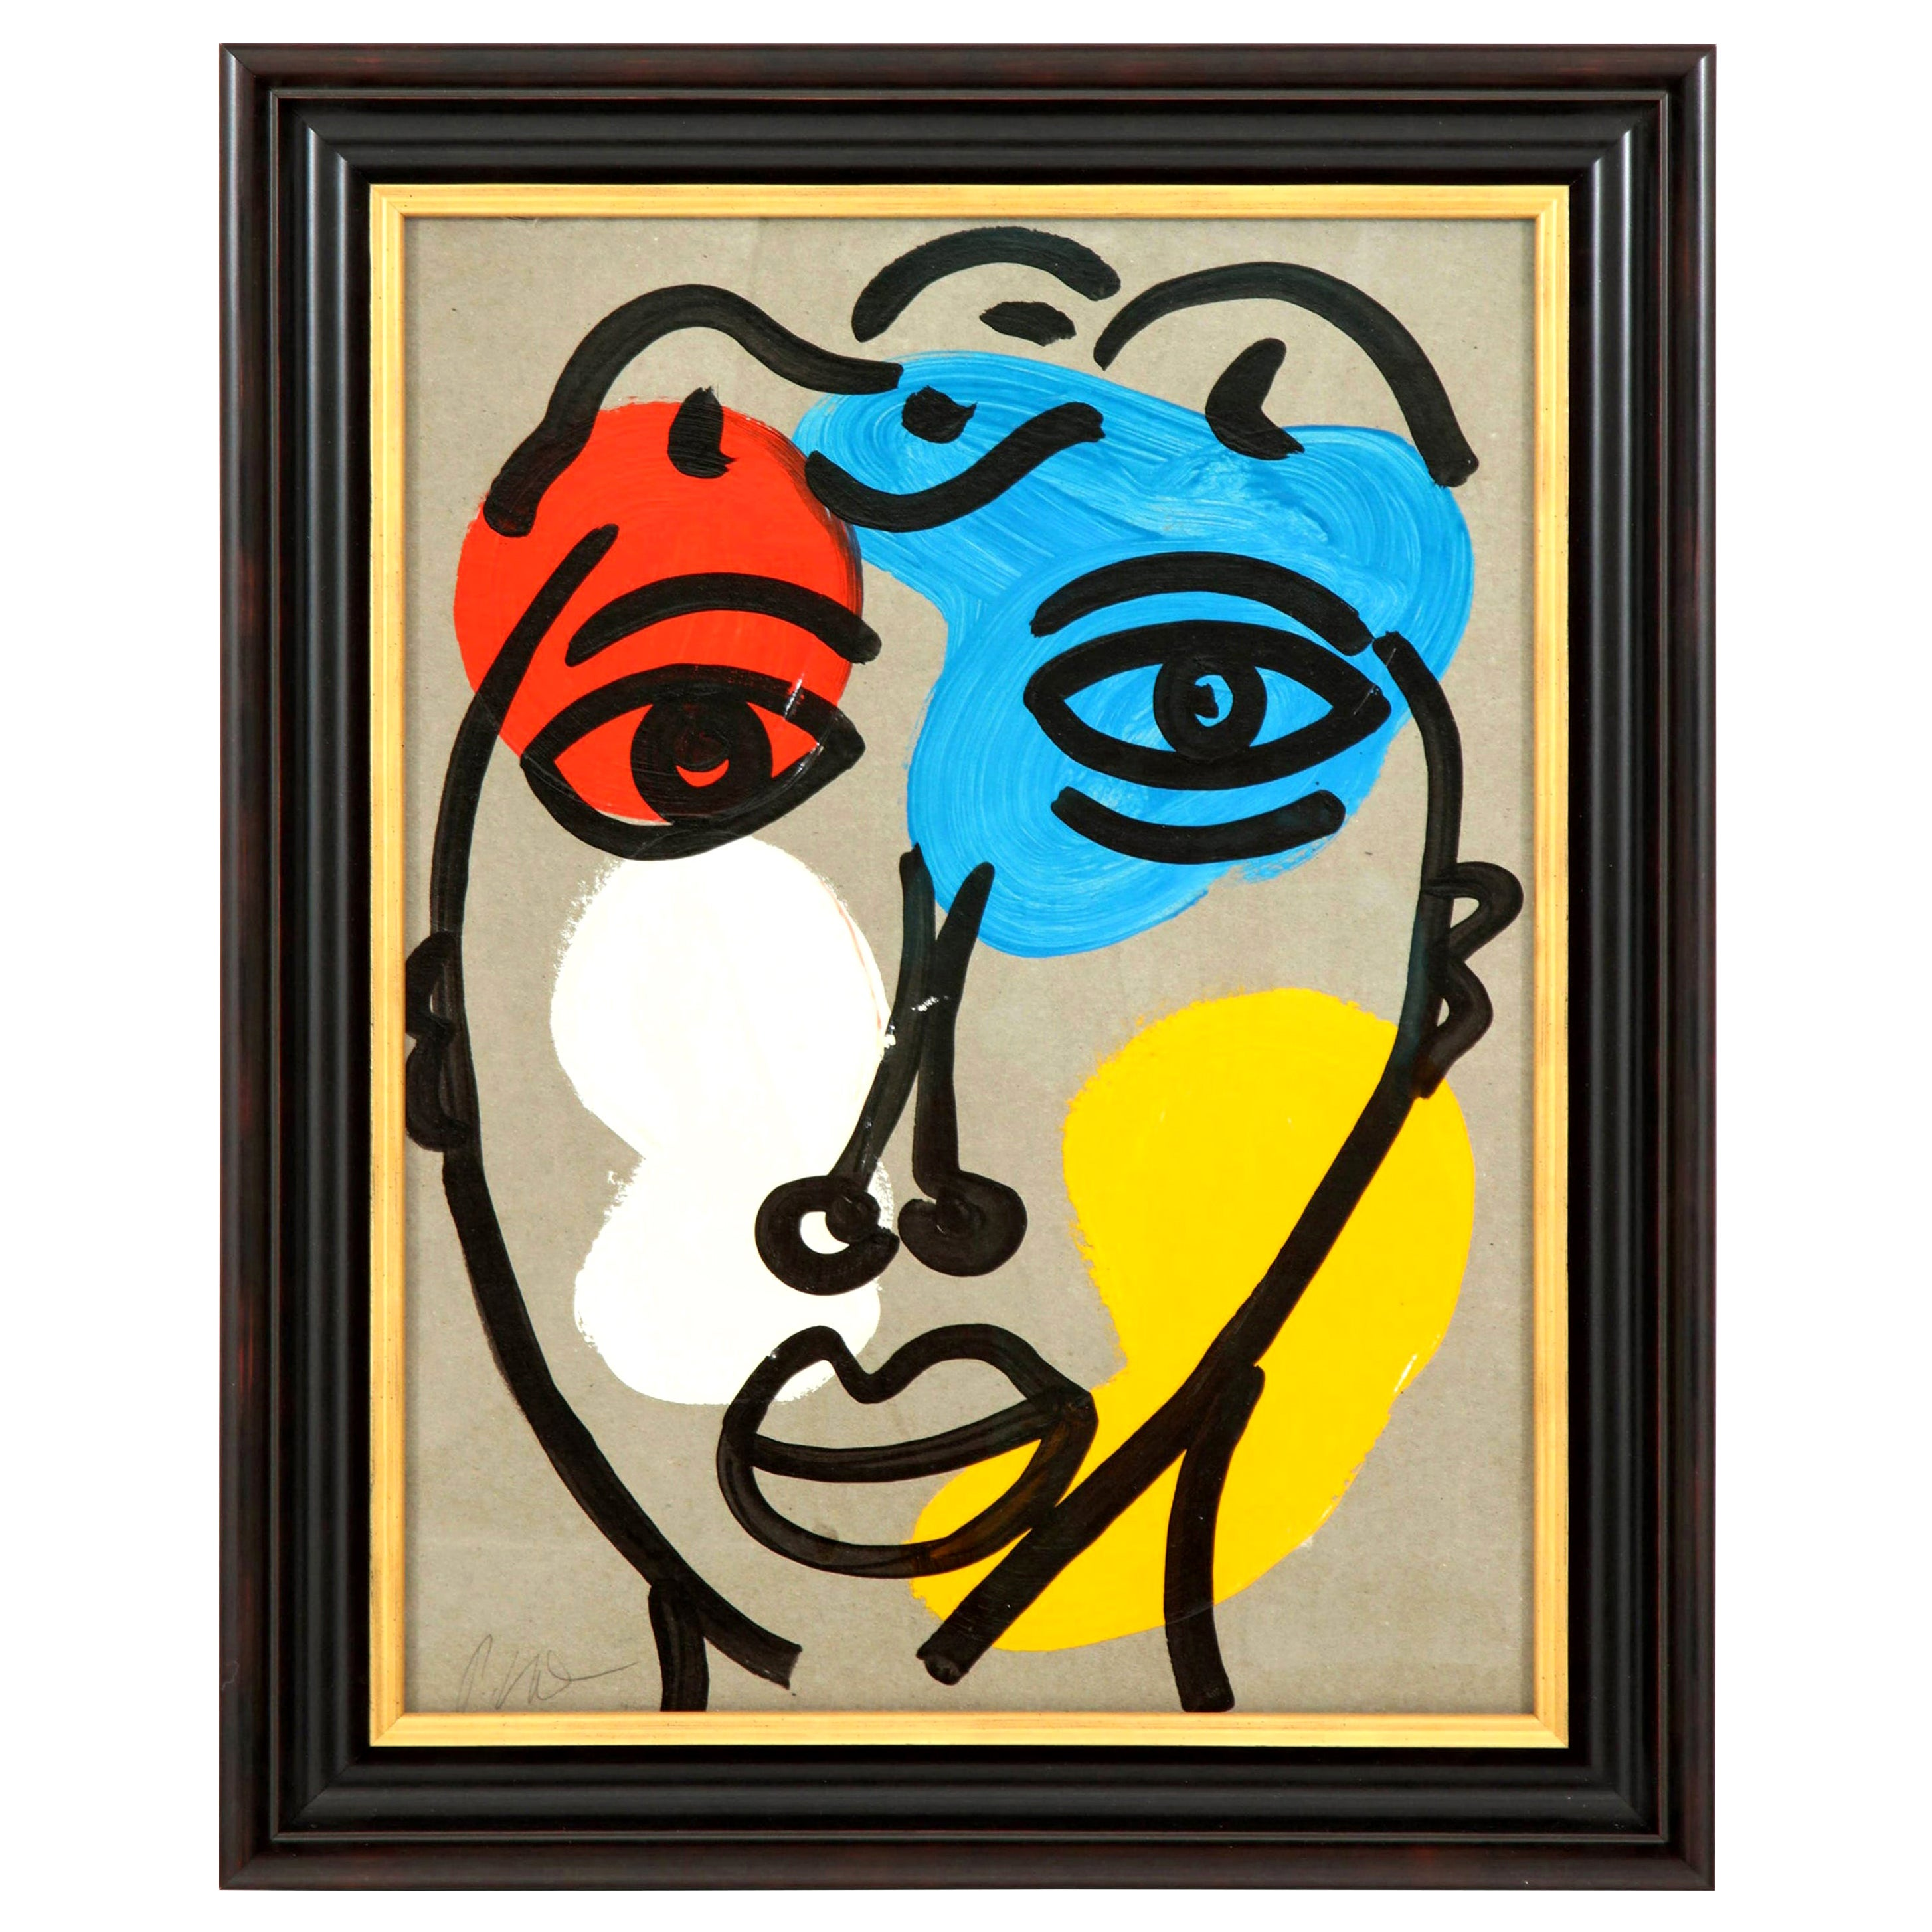 Painting by Peter Robert Keil, Midcentury Art, Red, Blue, Yellow, C 1970, Modern